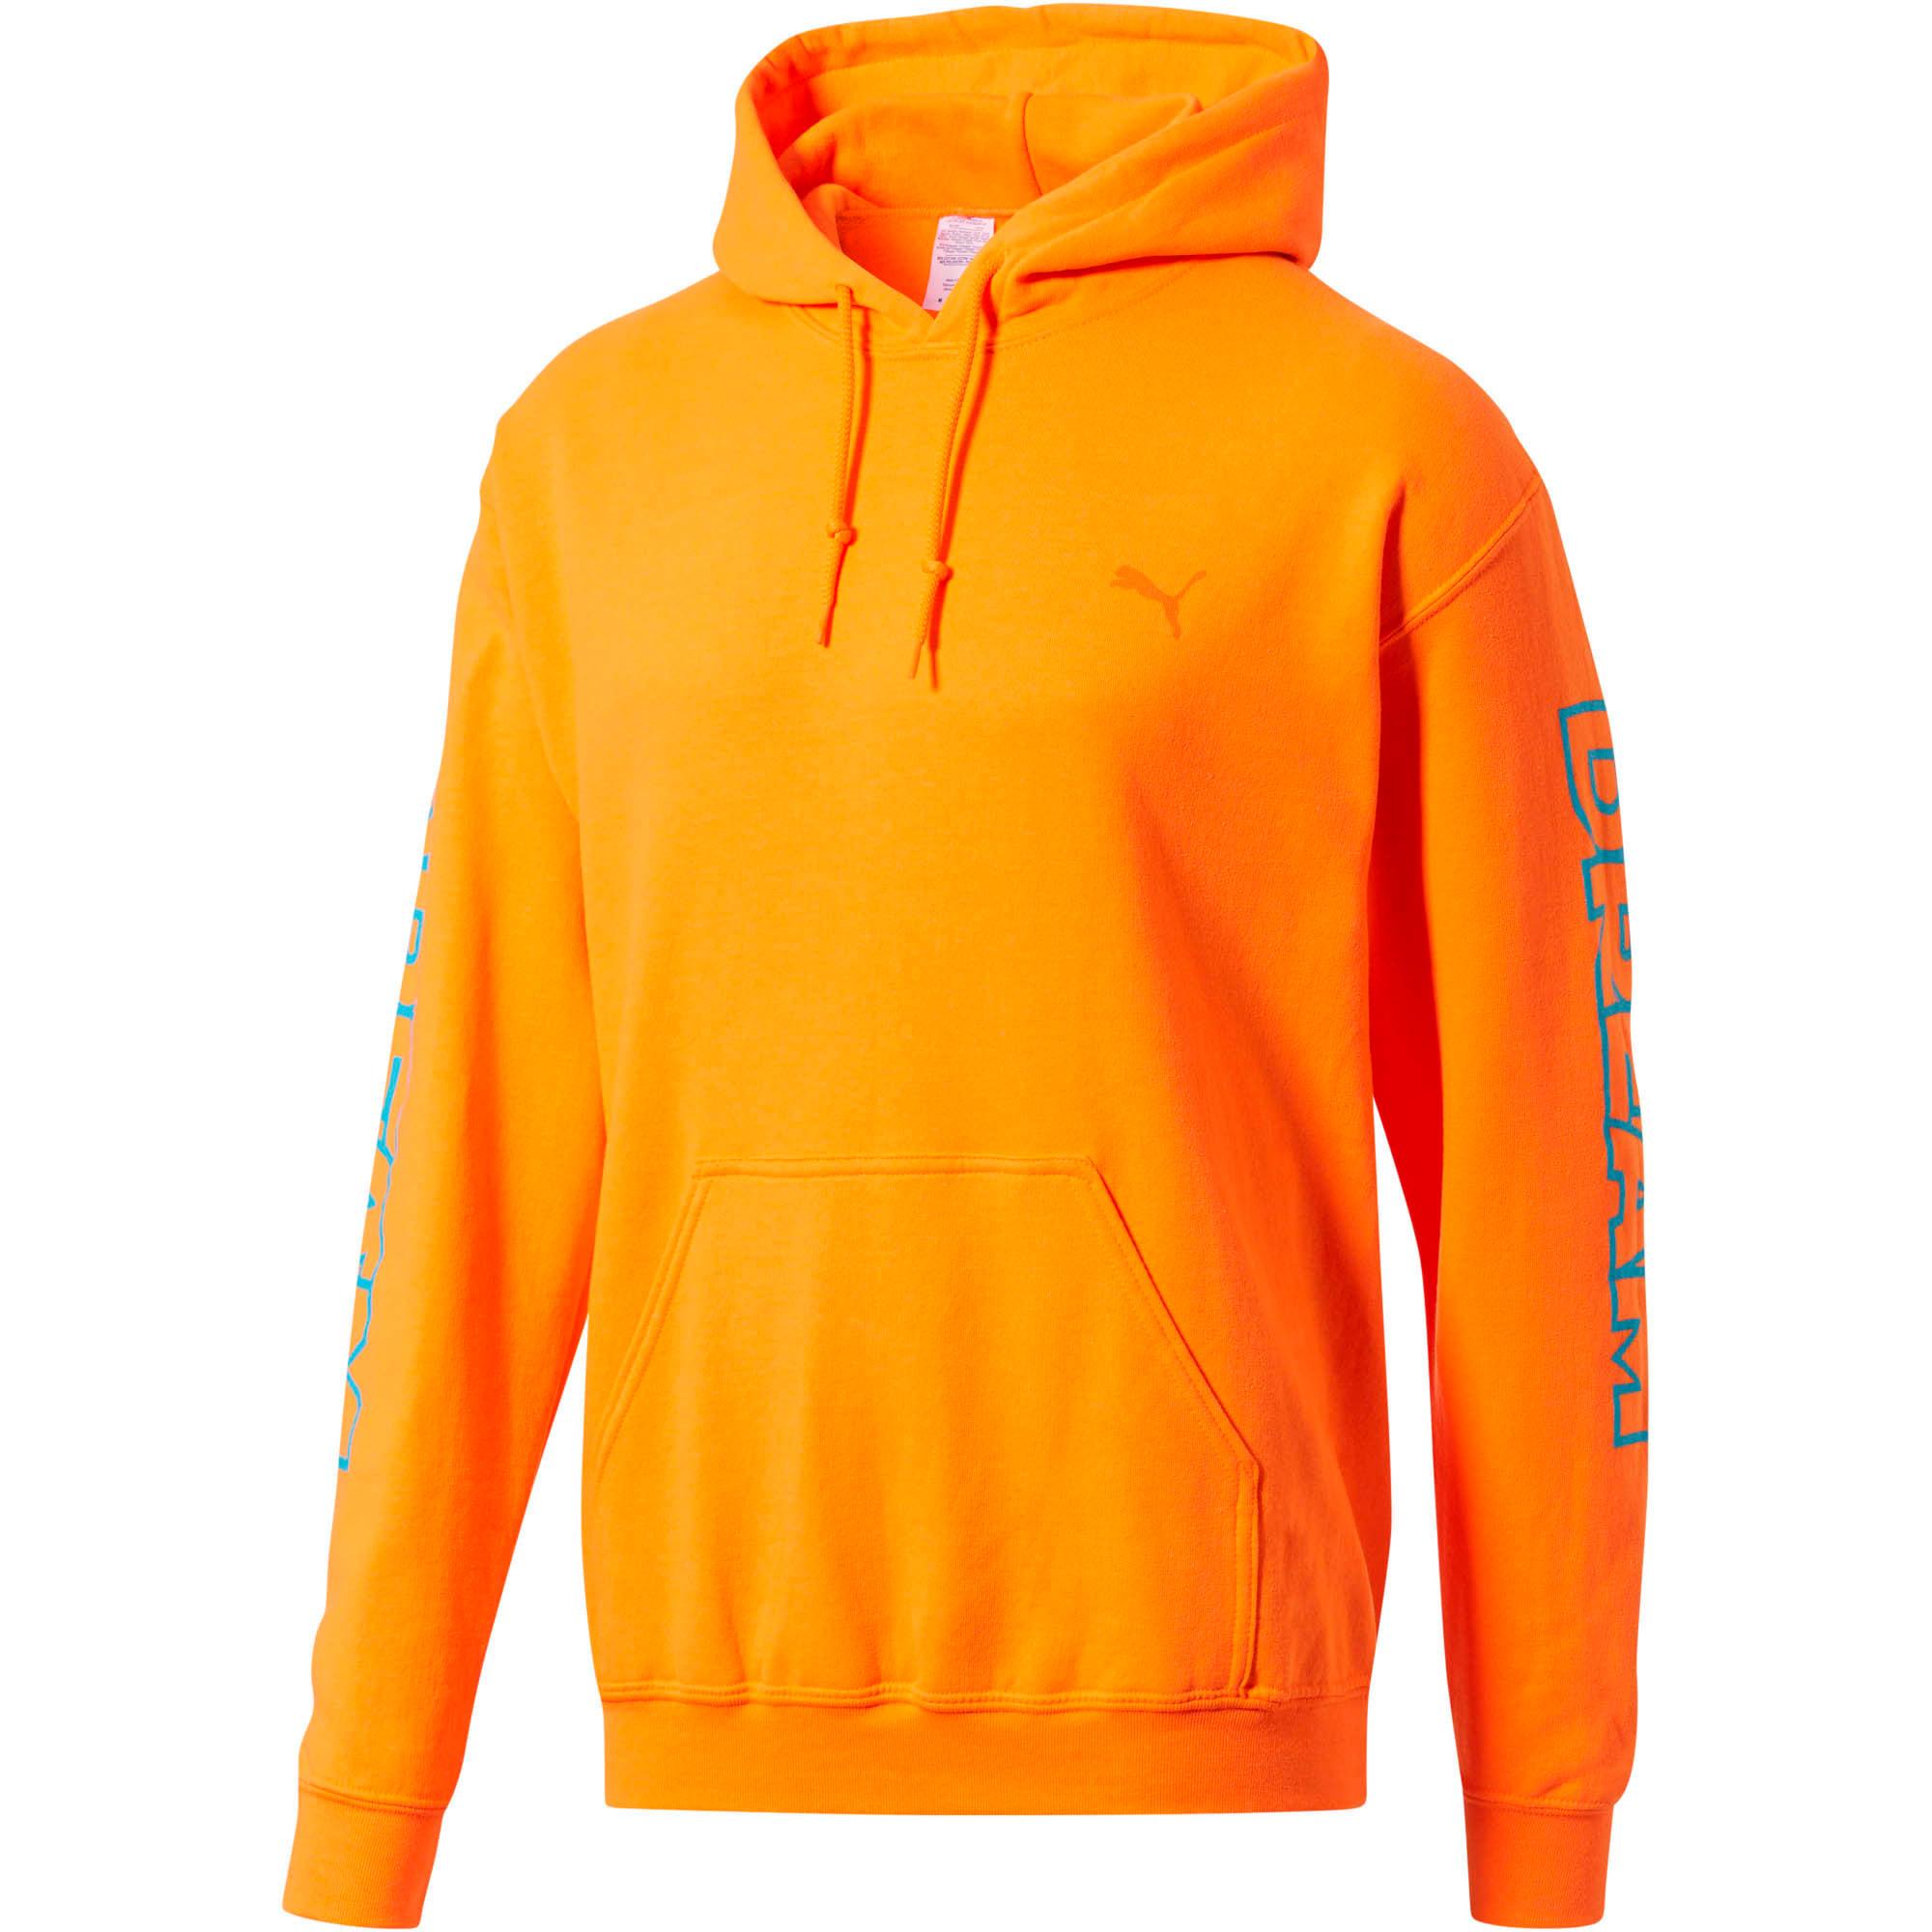 Thumbnail 1 of PUMA x DCMX Dream Hoodie, Safety Orange, medium